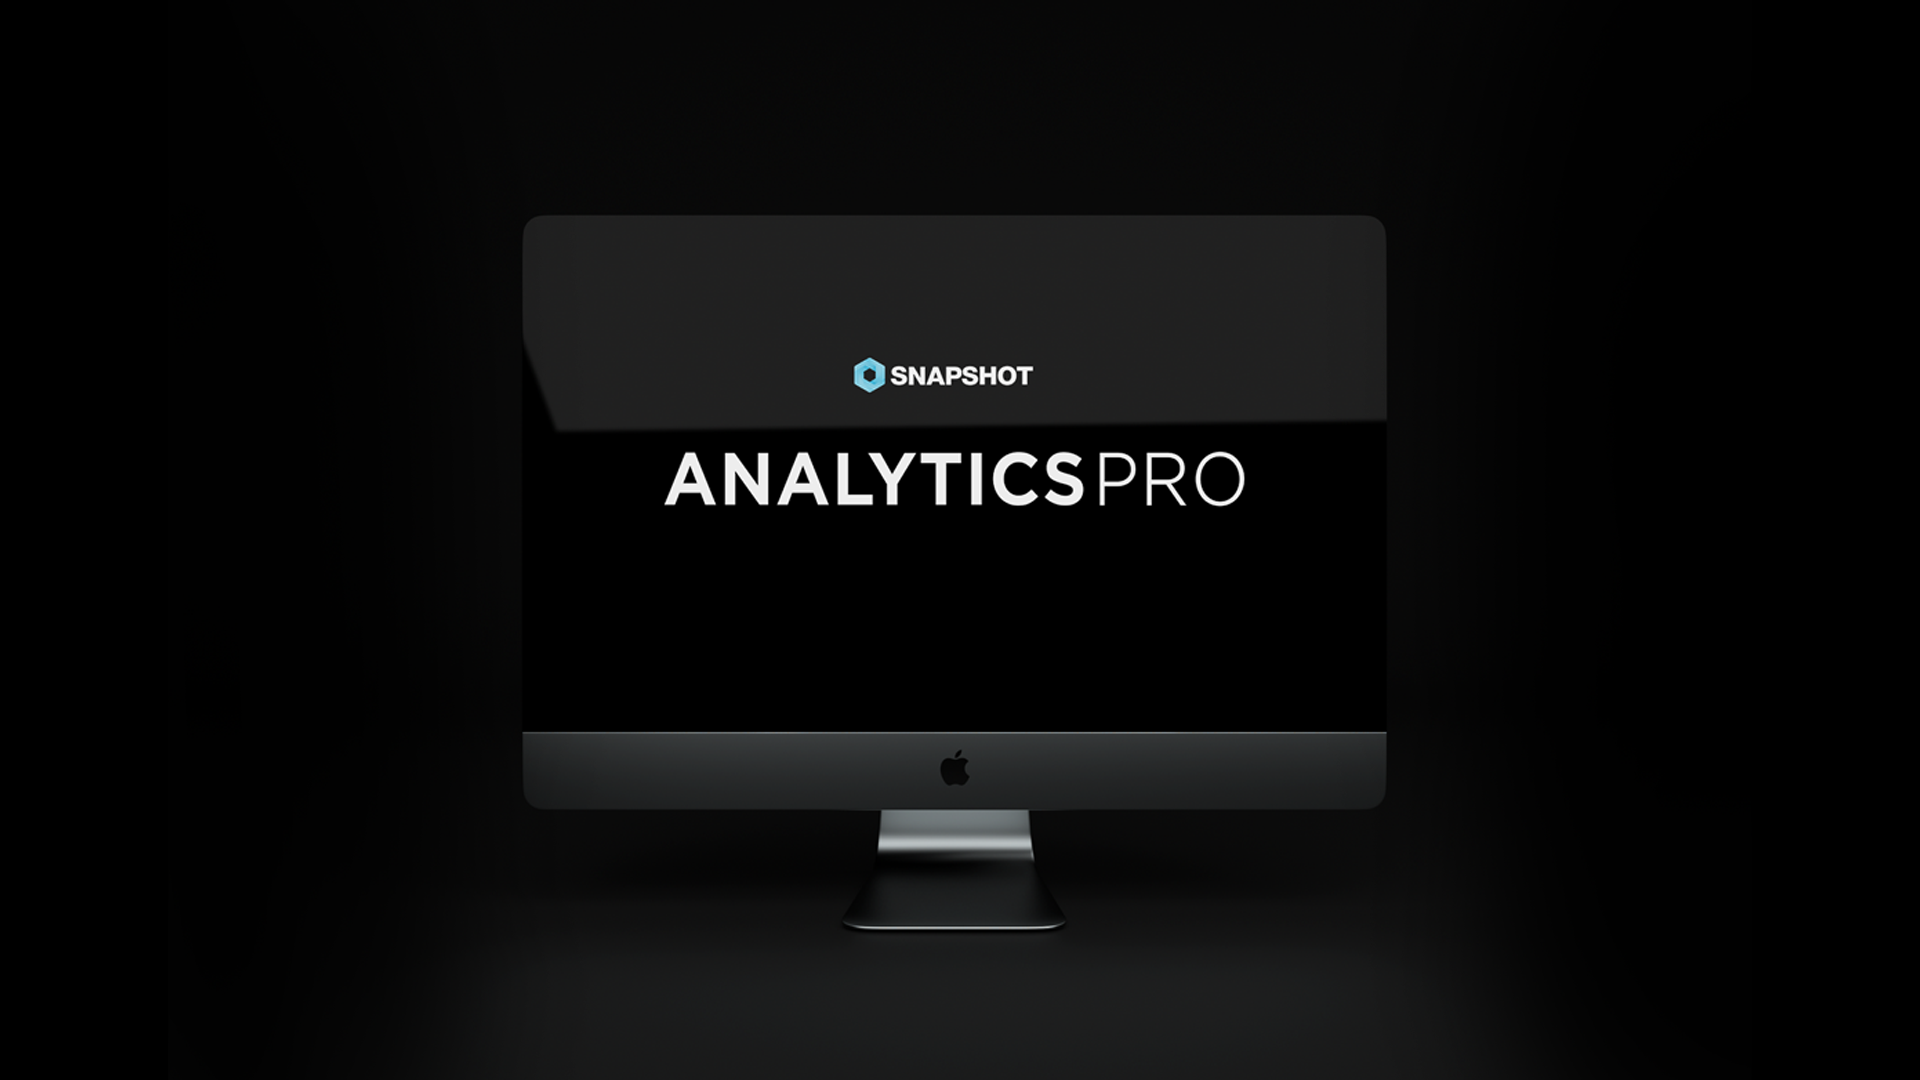 SnapShot AnalyticsPro POS Analytics